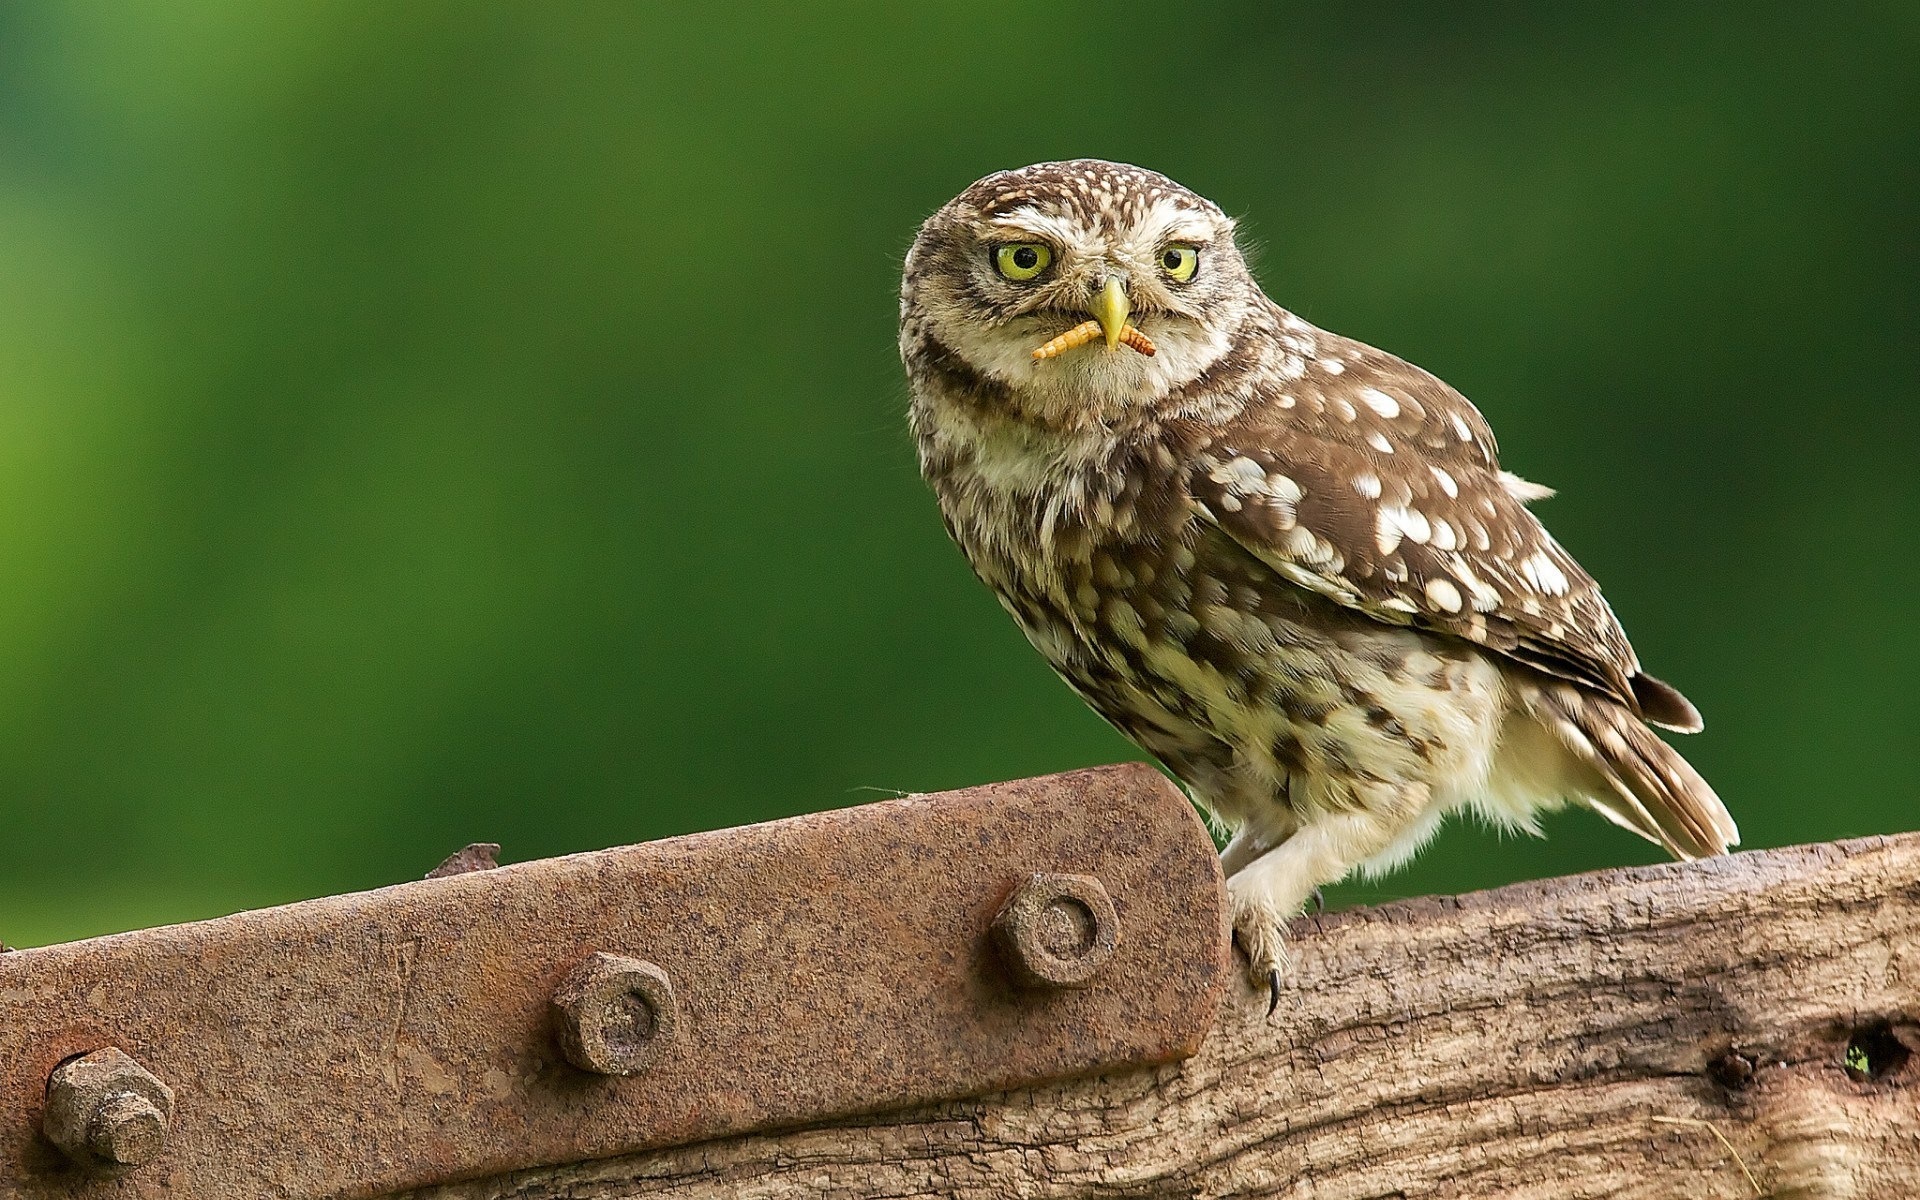 Angry Bird Space Wallpaper 3d Owl Hunting Hd Desktop Wallpapers 4k Hd